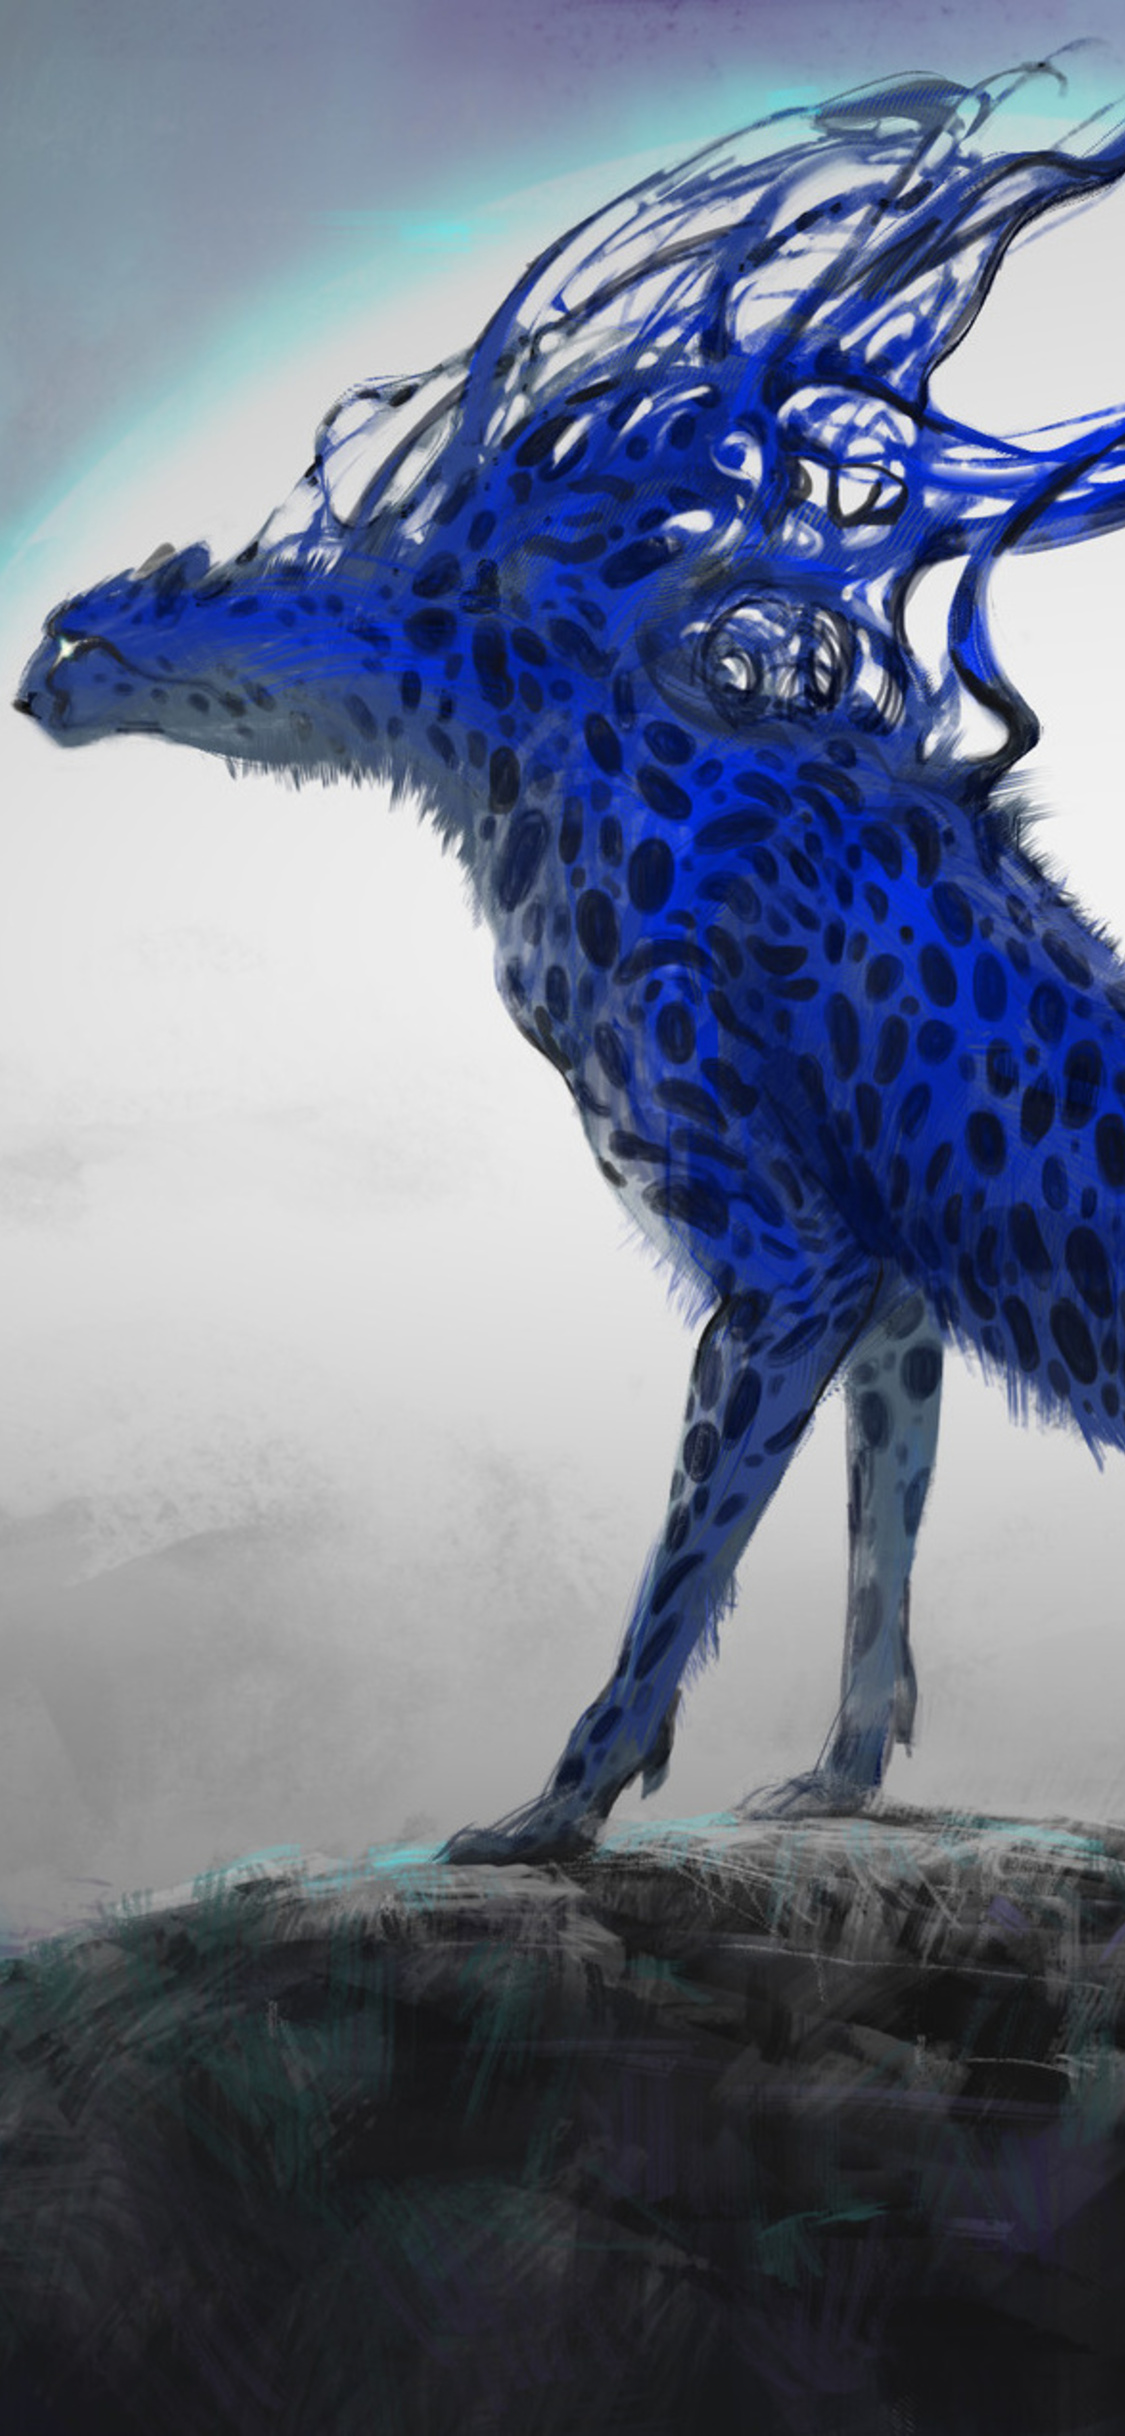 cheetah-digital-concept-art-x1.jpg